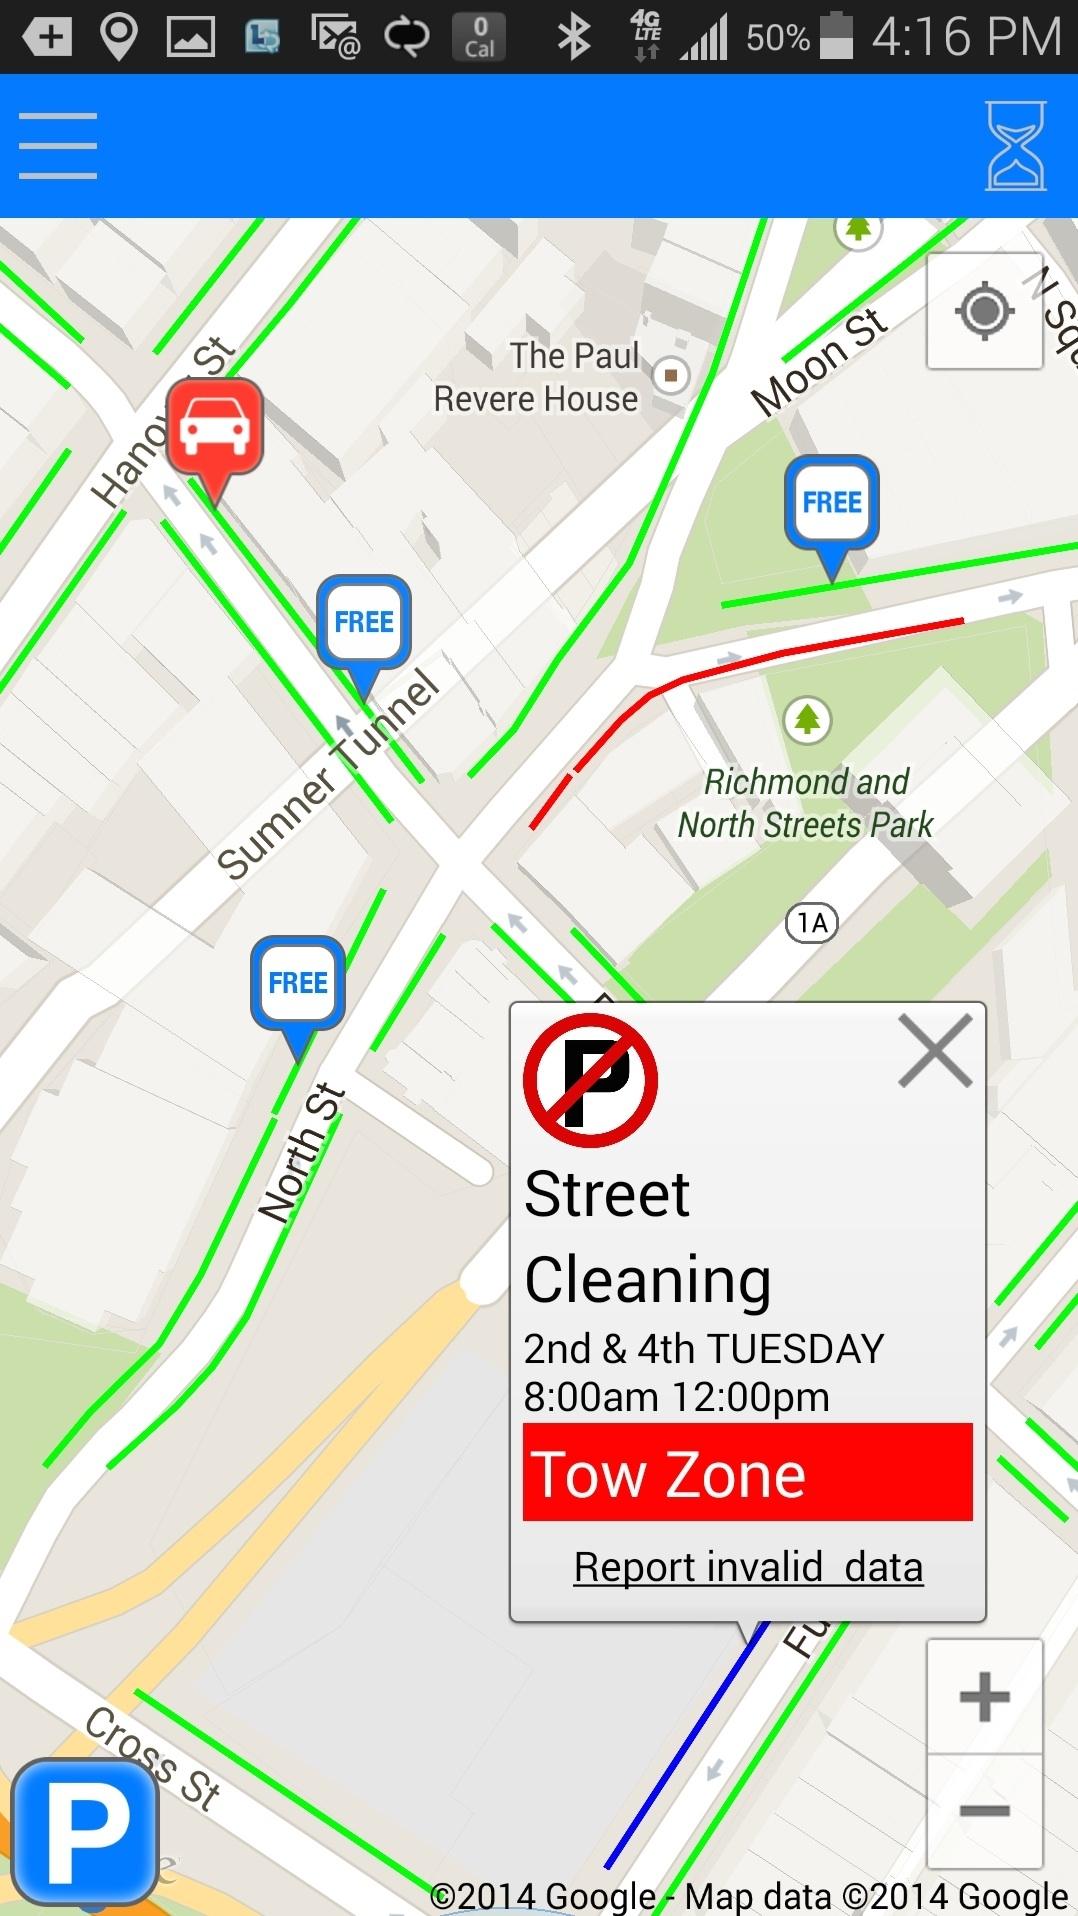 Nyc Parking Map Alternate Side - Calendar Inspiration Design throughout Alternate Side Parking 2022 Calendar